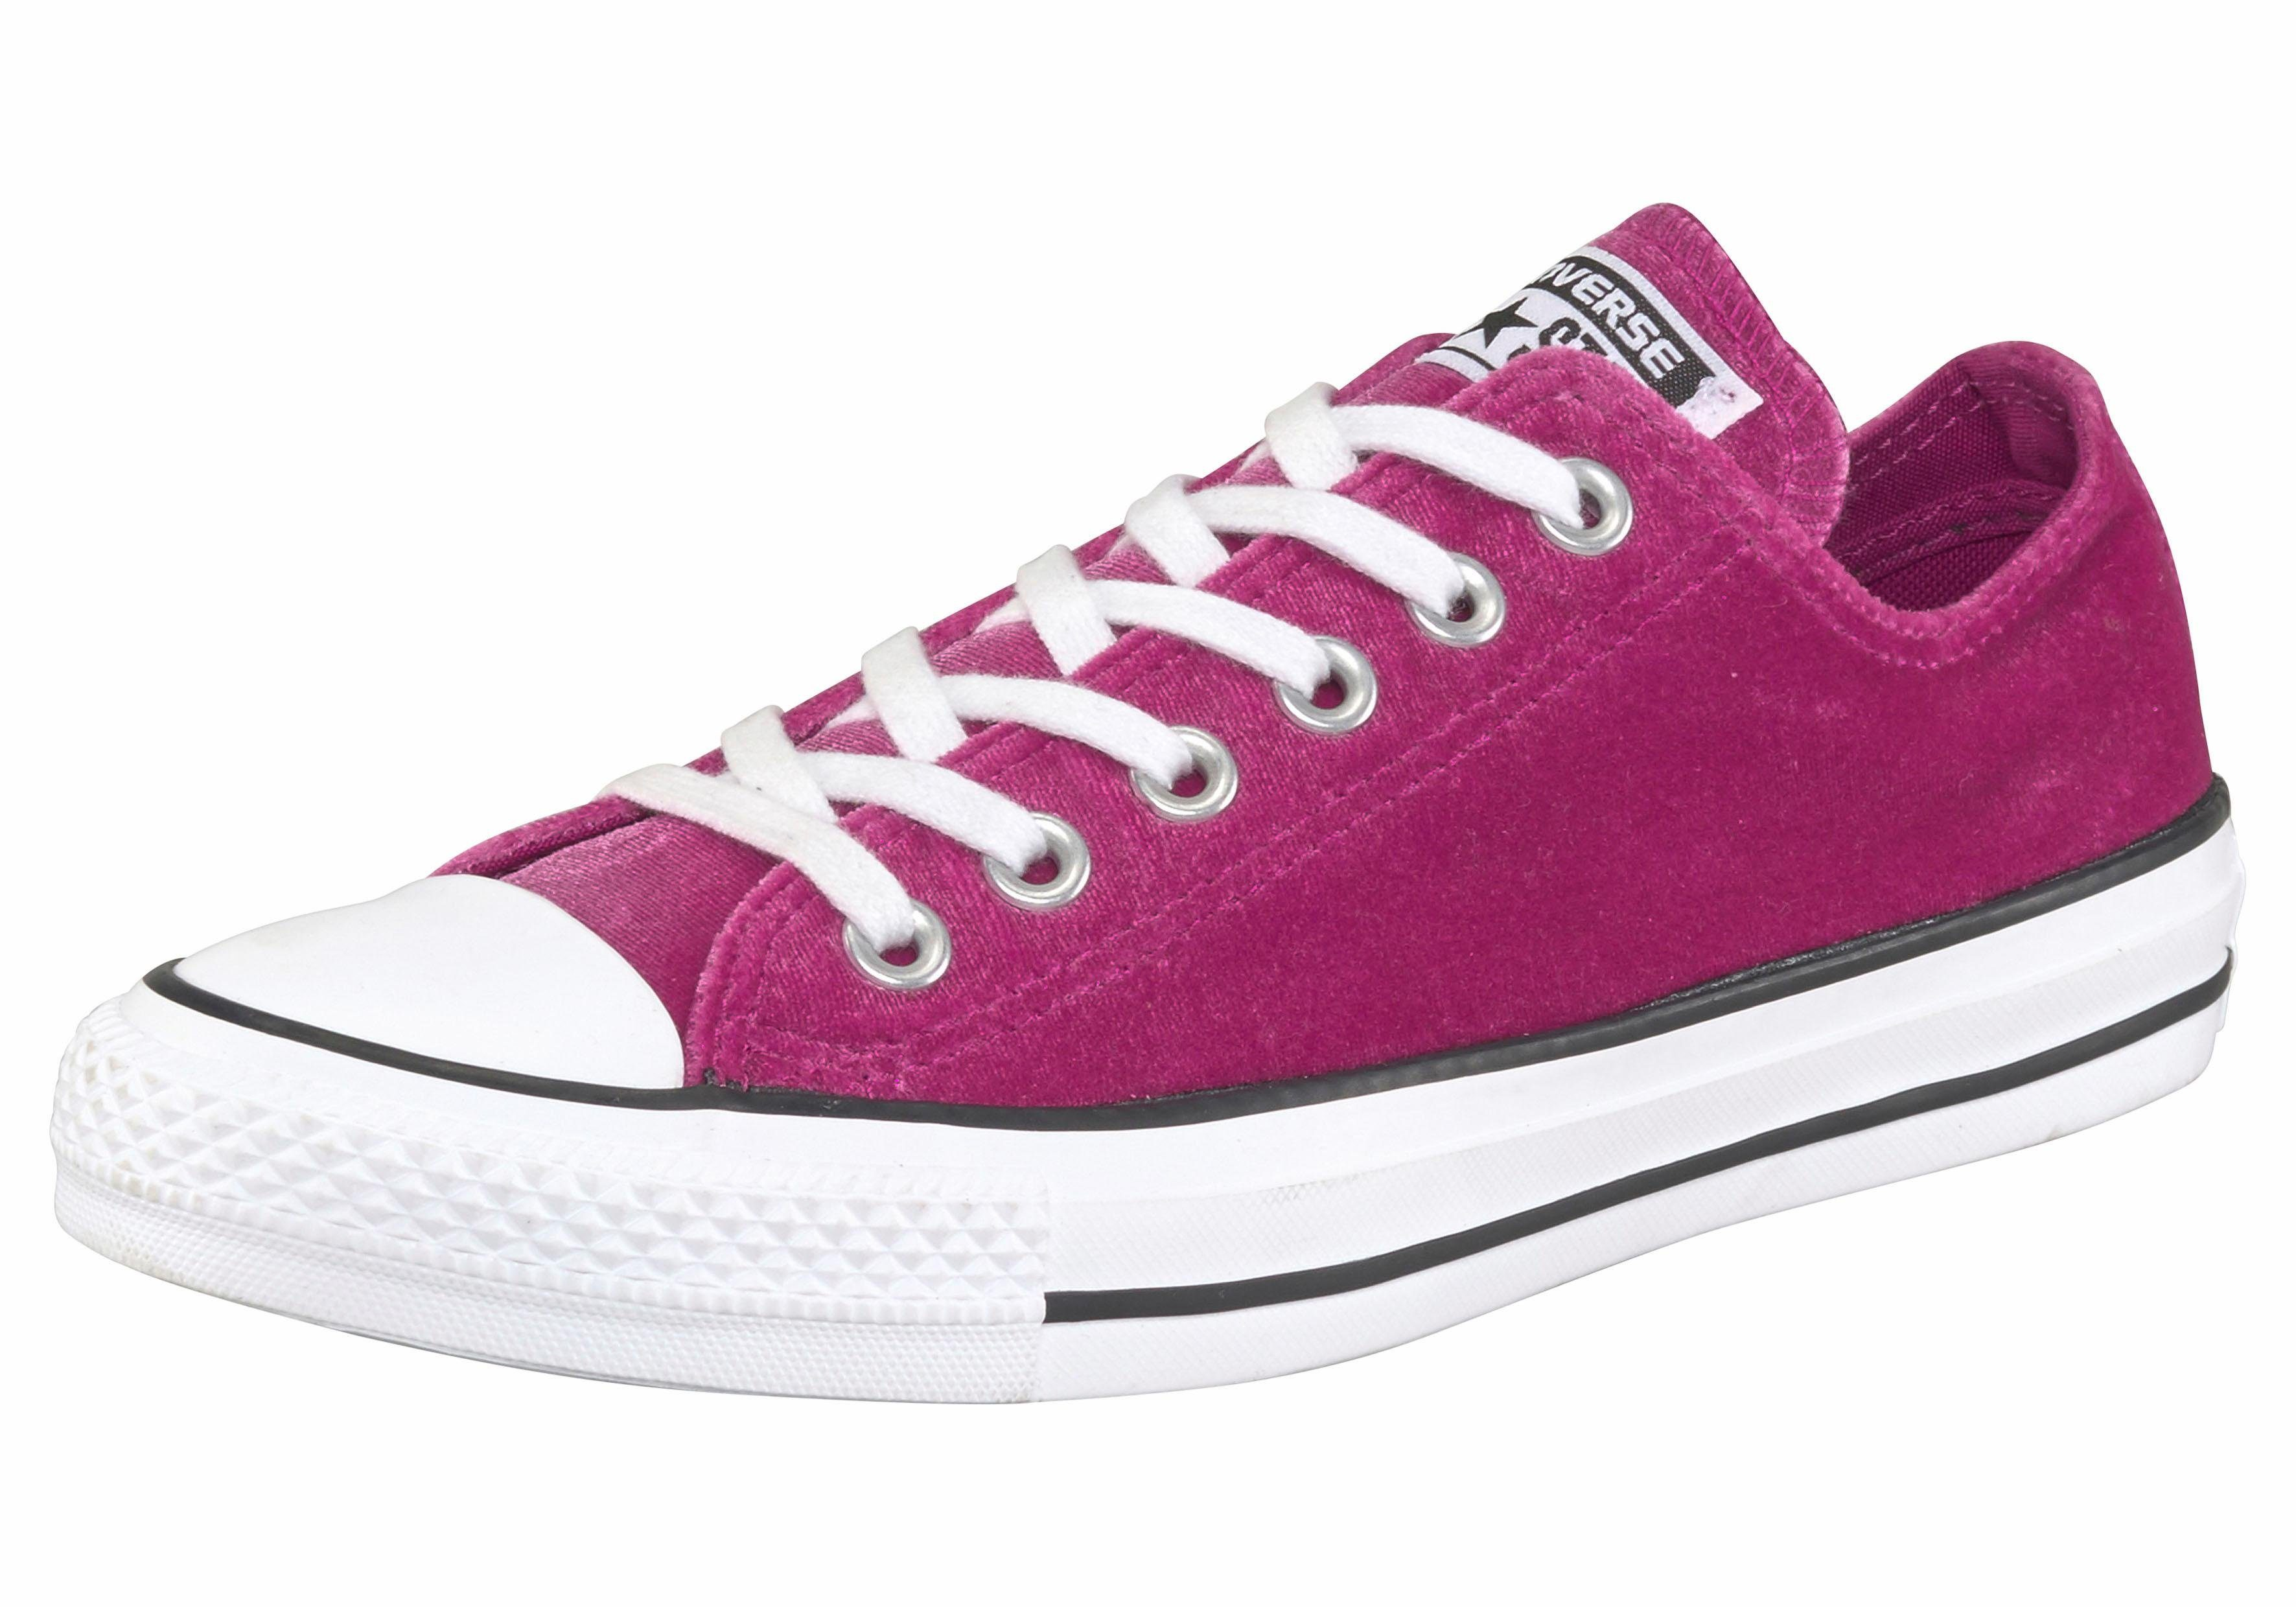 Converse Chuck Taylor All Star Ox Sneaker, Samt  pink